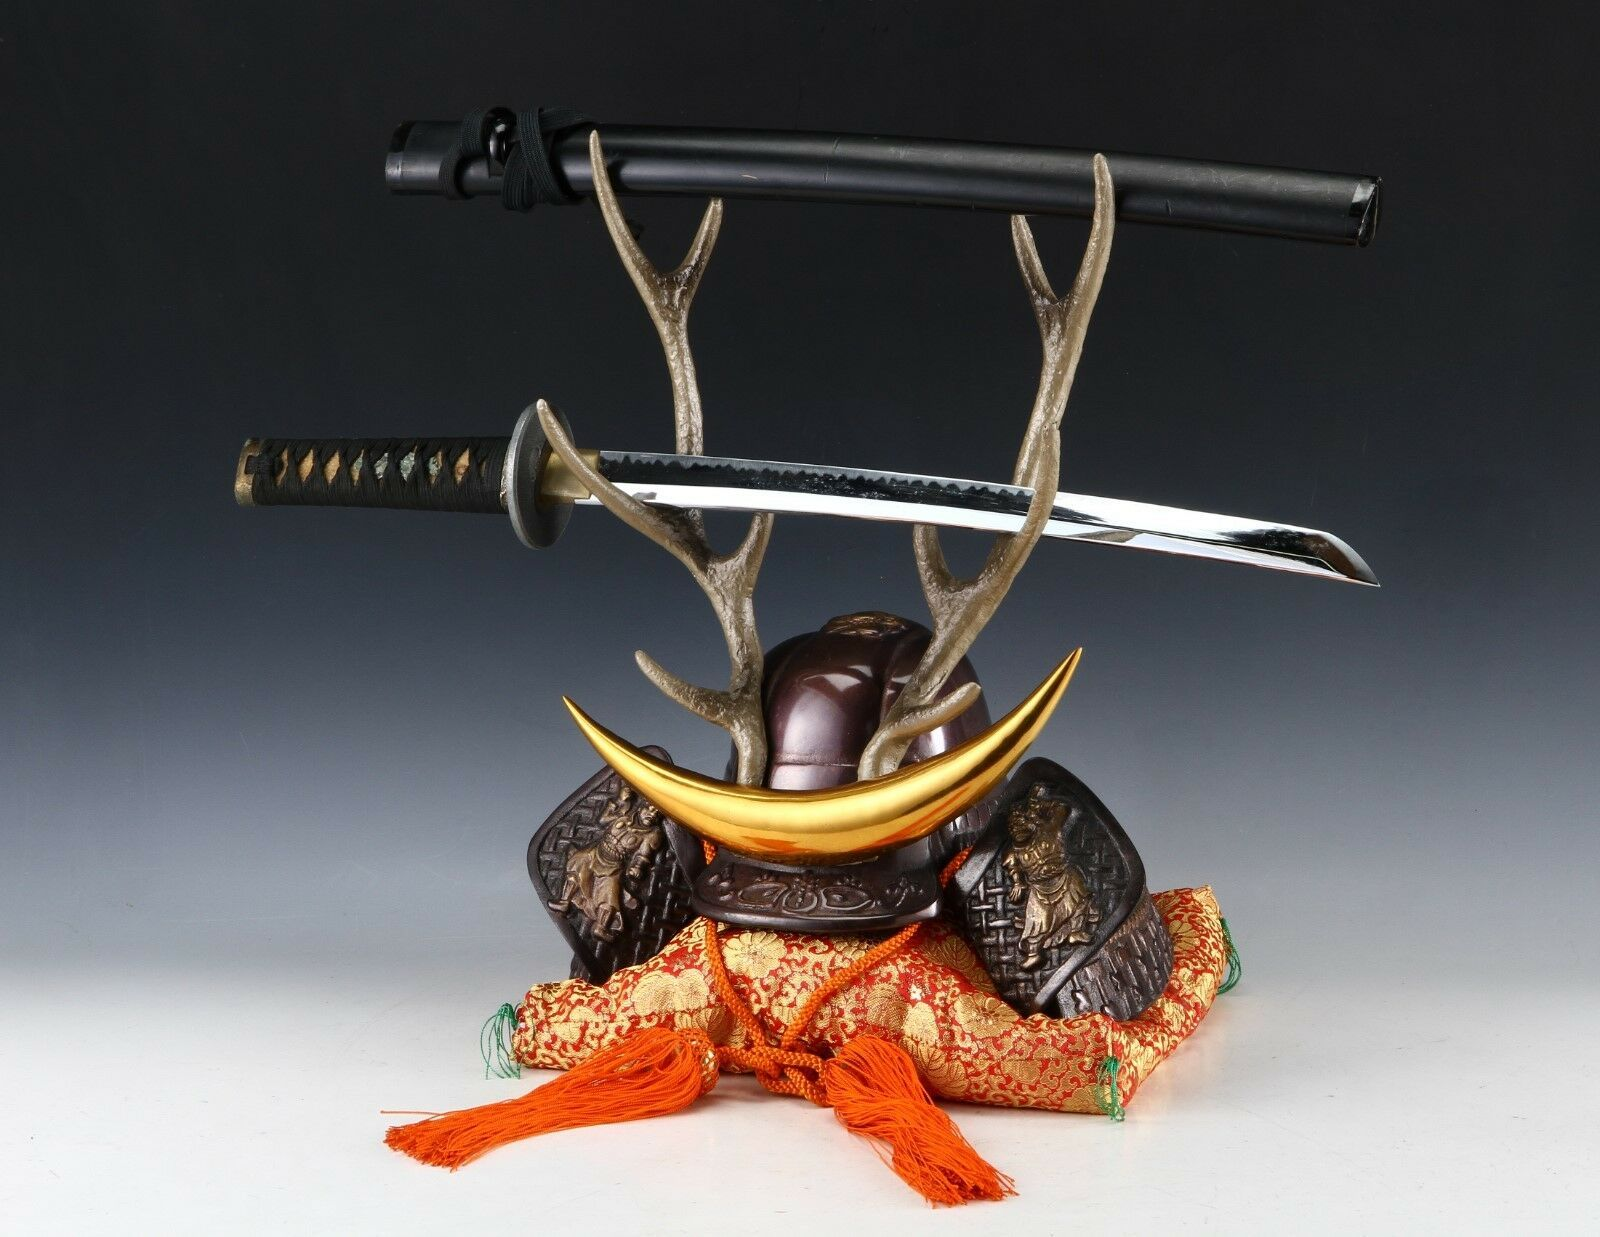 Japanese Beautiful Samurai Helmet -shikanosuke kabuto- with a Replica Blade image 11